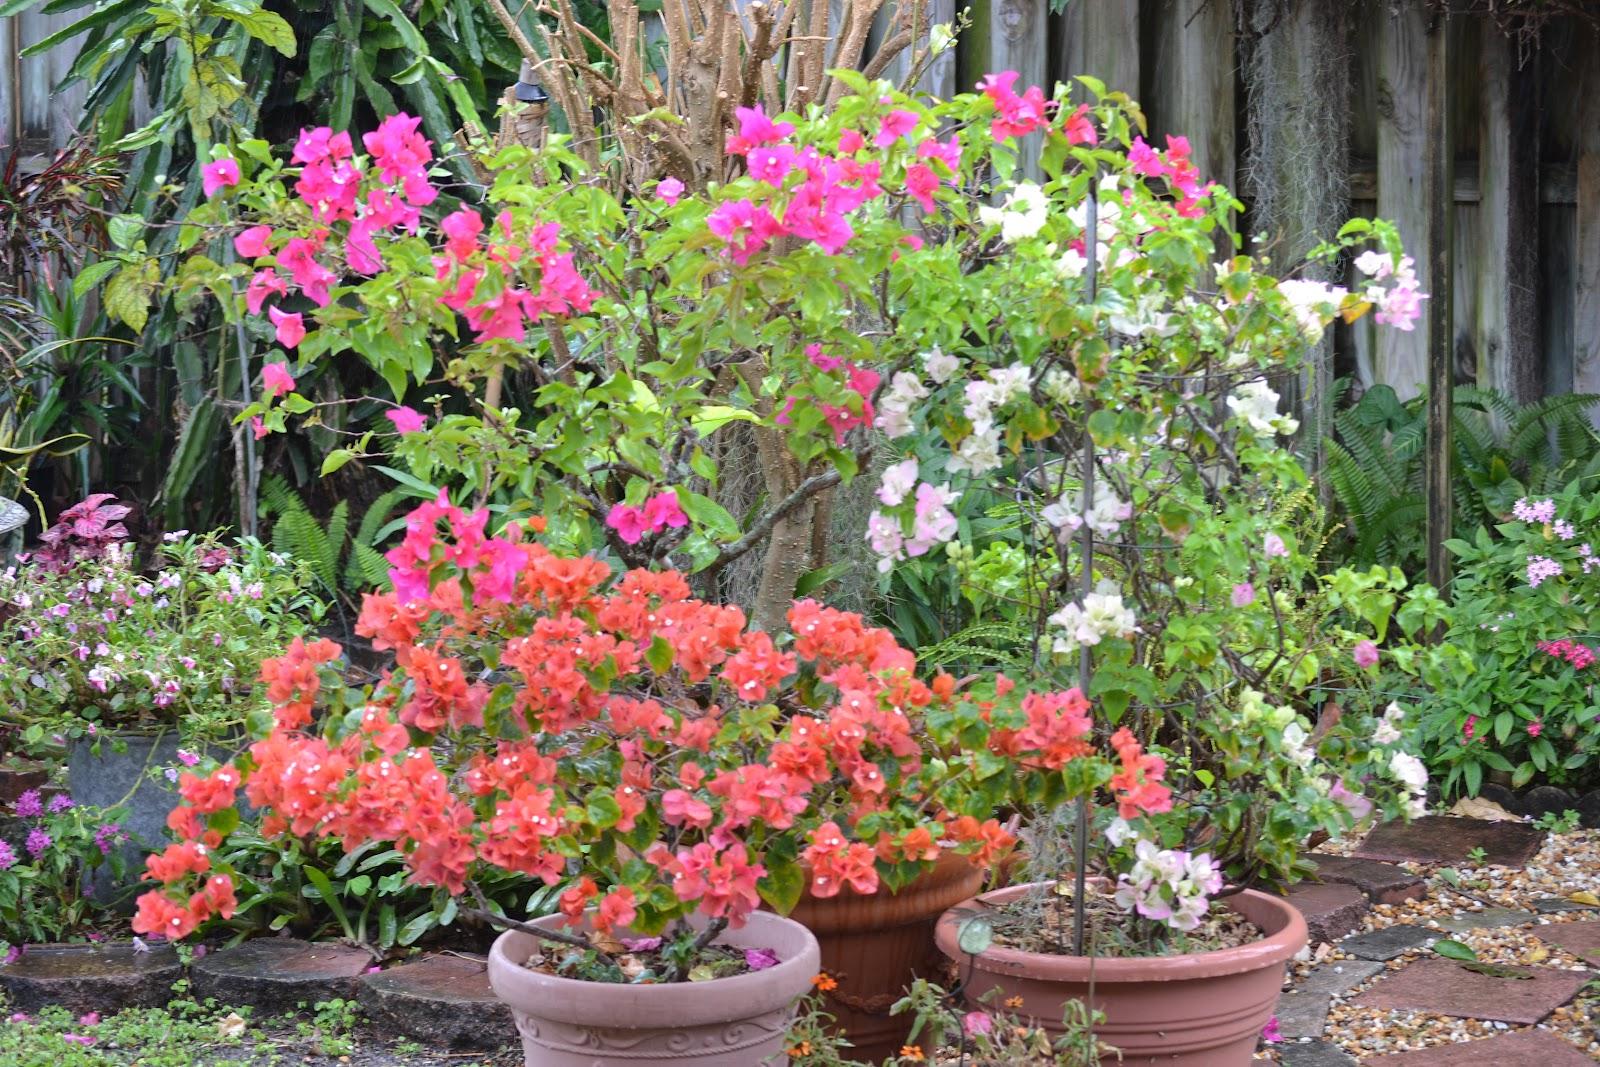 DragonFly Garden: Bouganvillea plants belong in containers